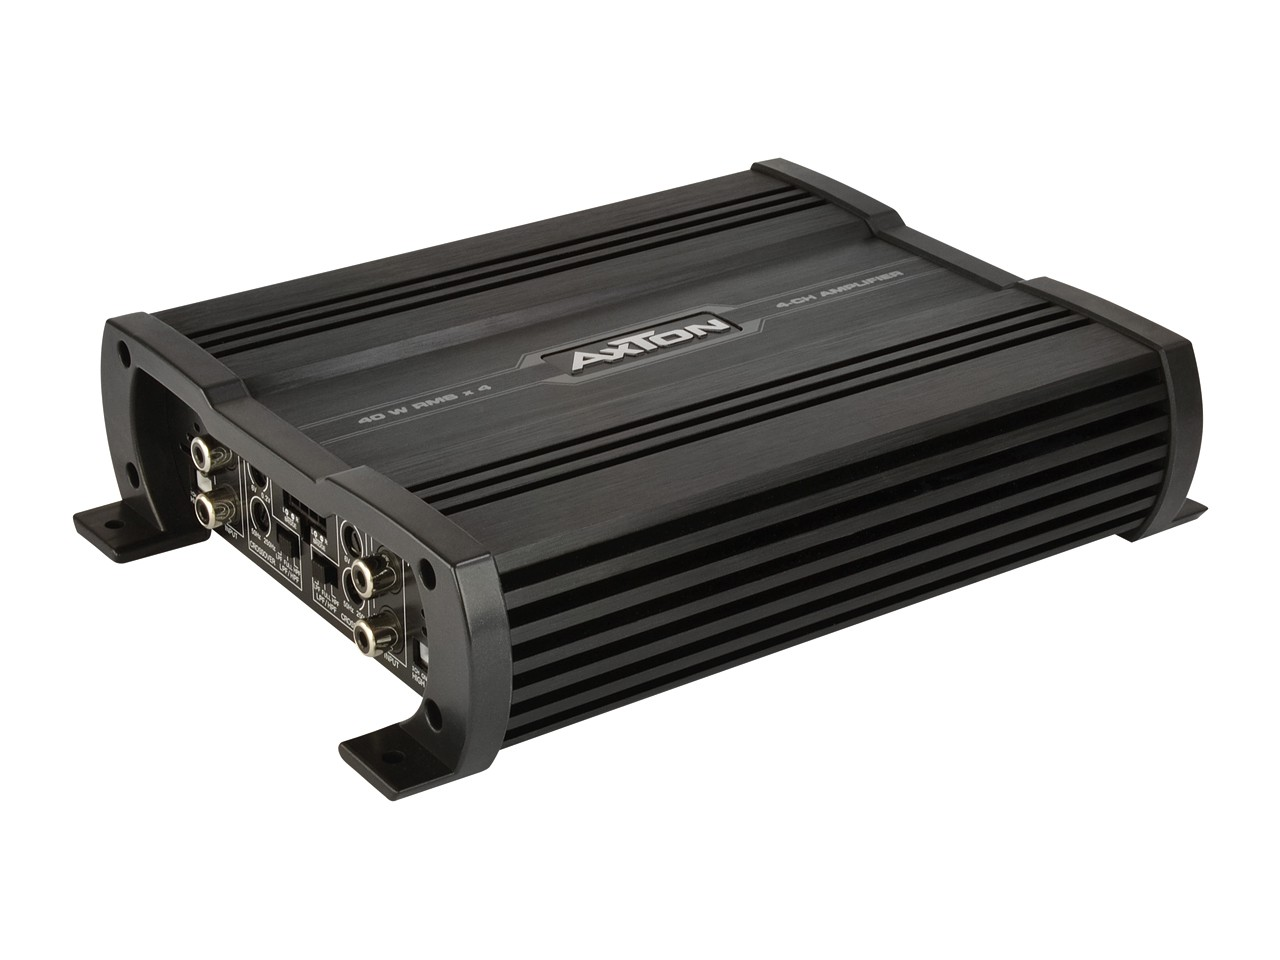 A4050X - AXTON Diecast Amplifier 4 x 40 Watt